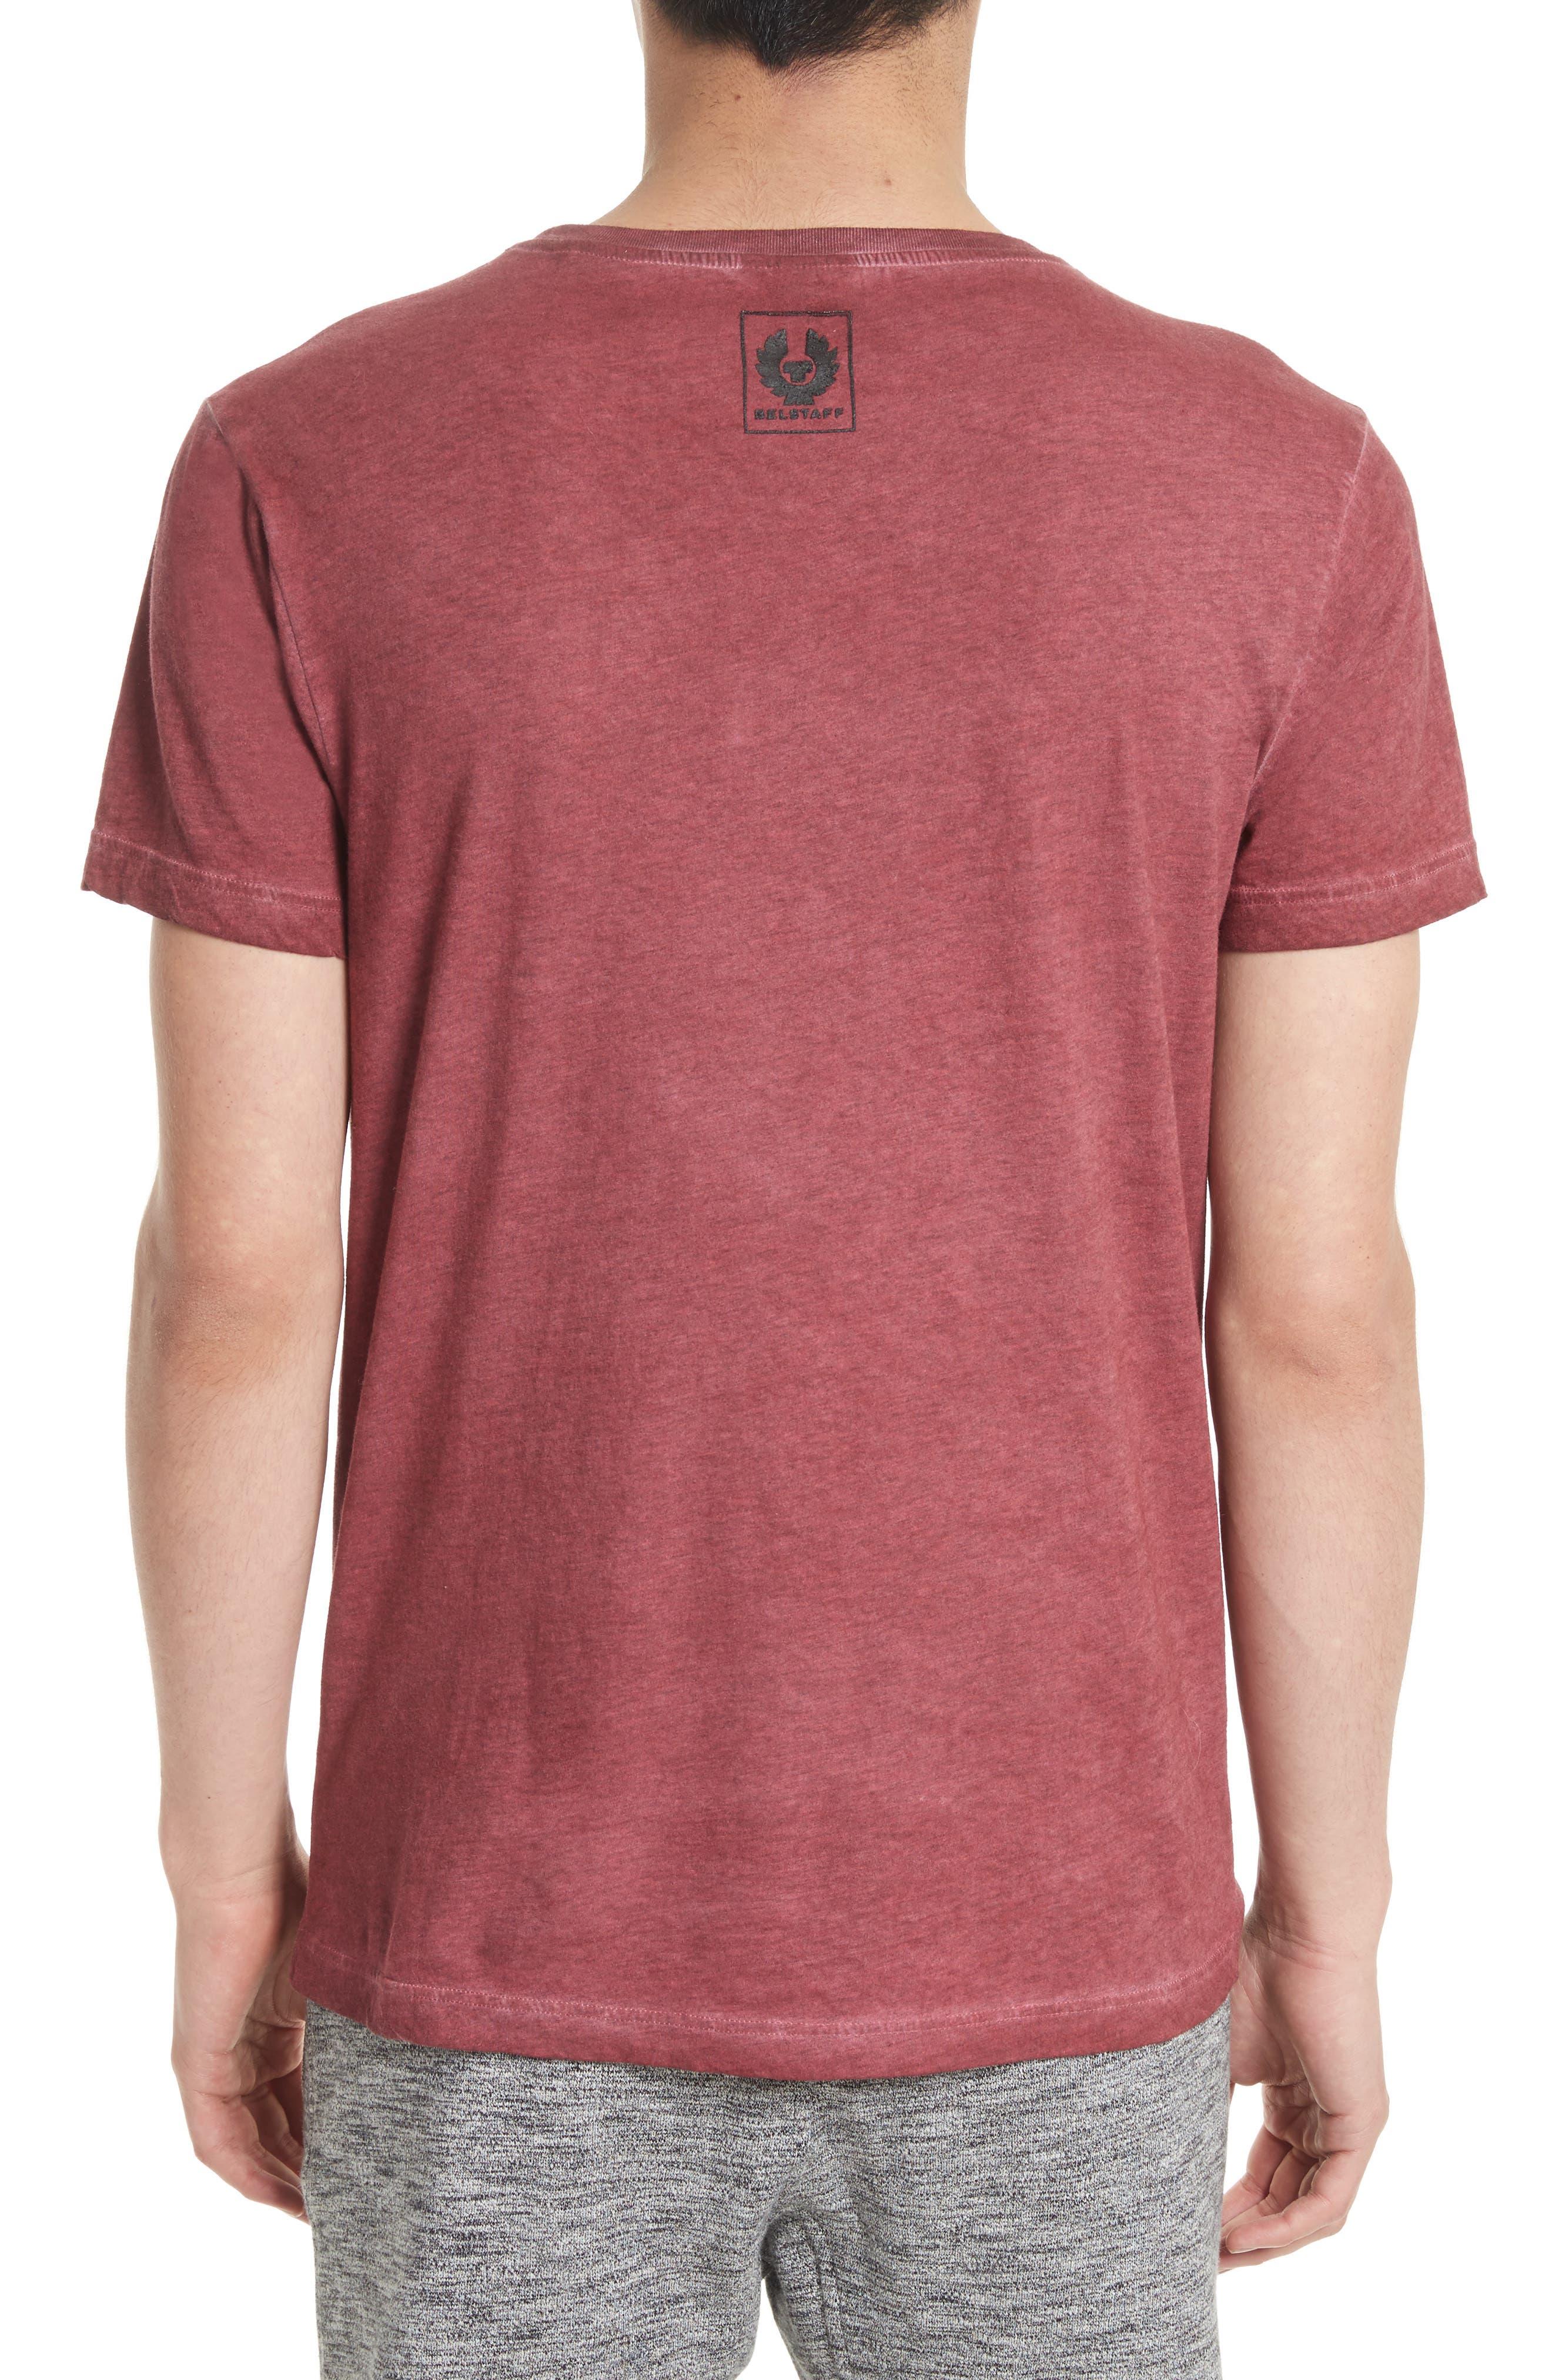 Alternate Image 2  - Belstaff 'Trafford' Cotton Crewneck T-Shirt